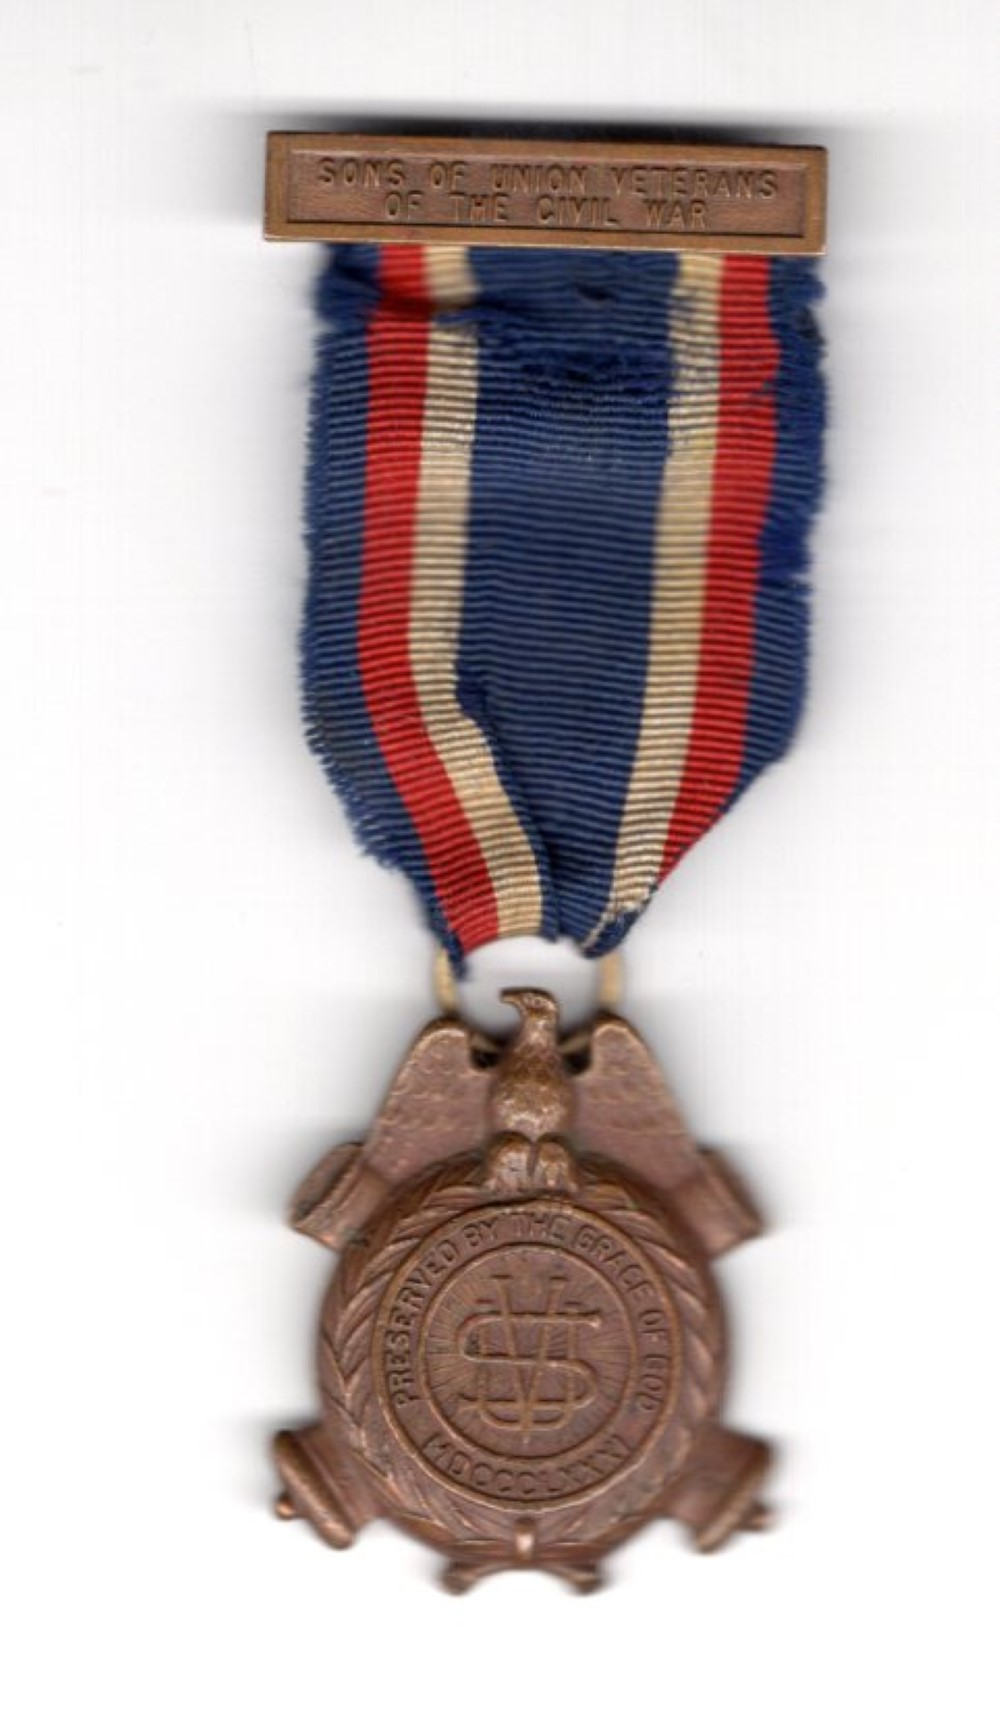 Sons of Union Veterans medal